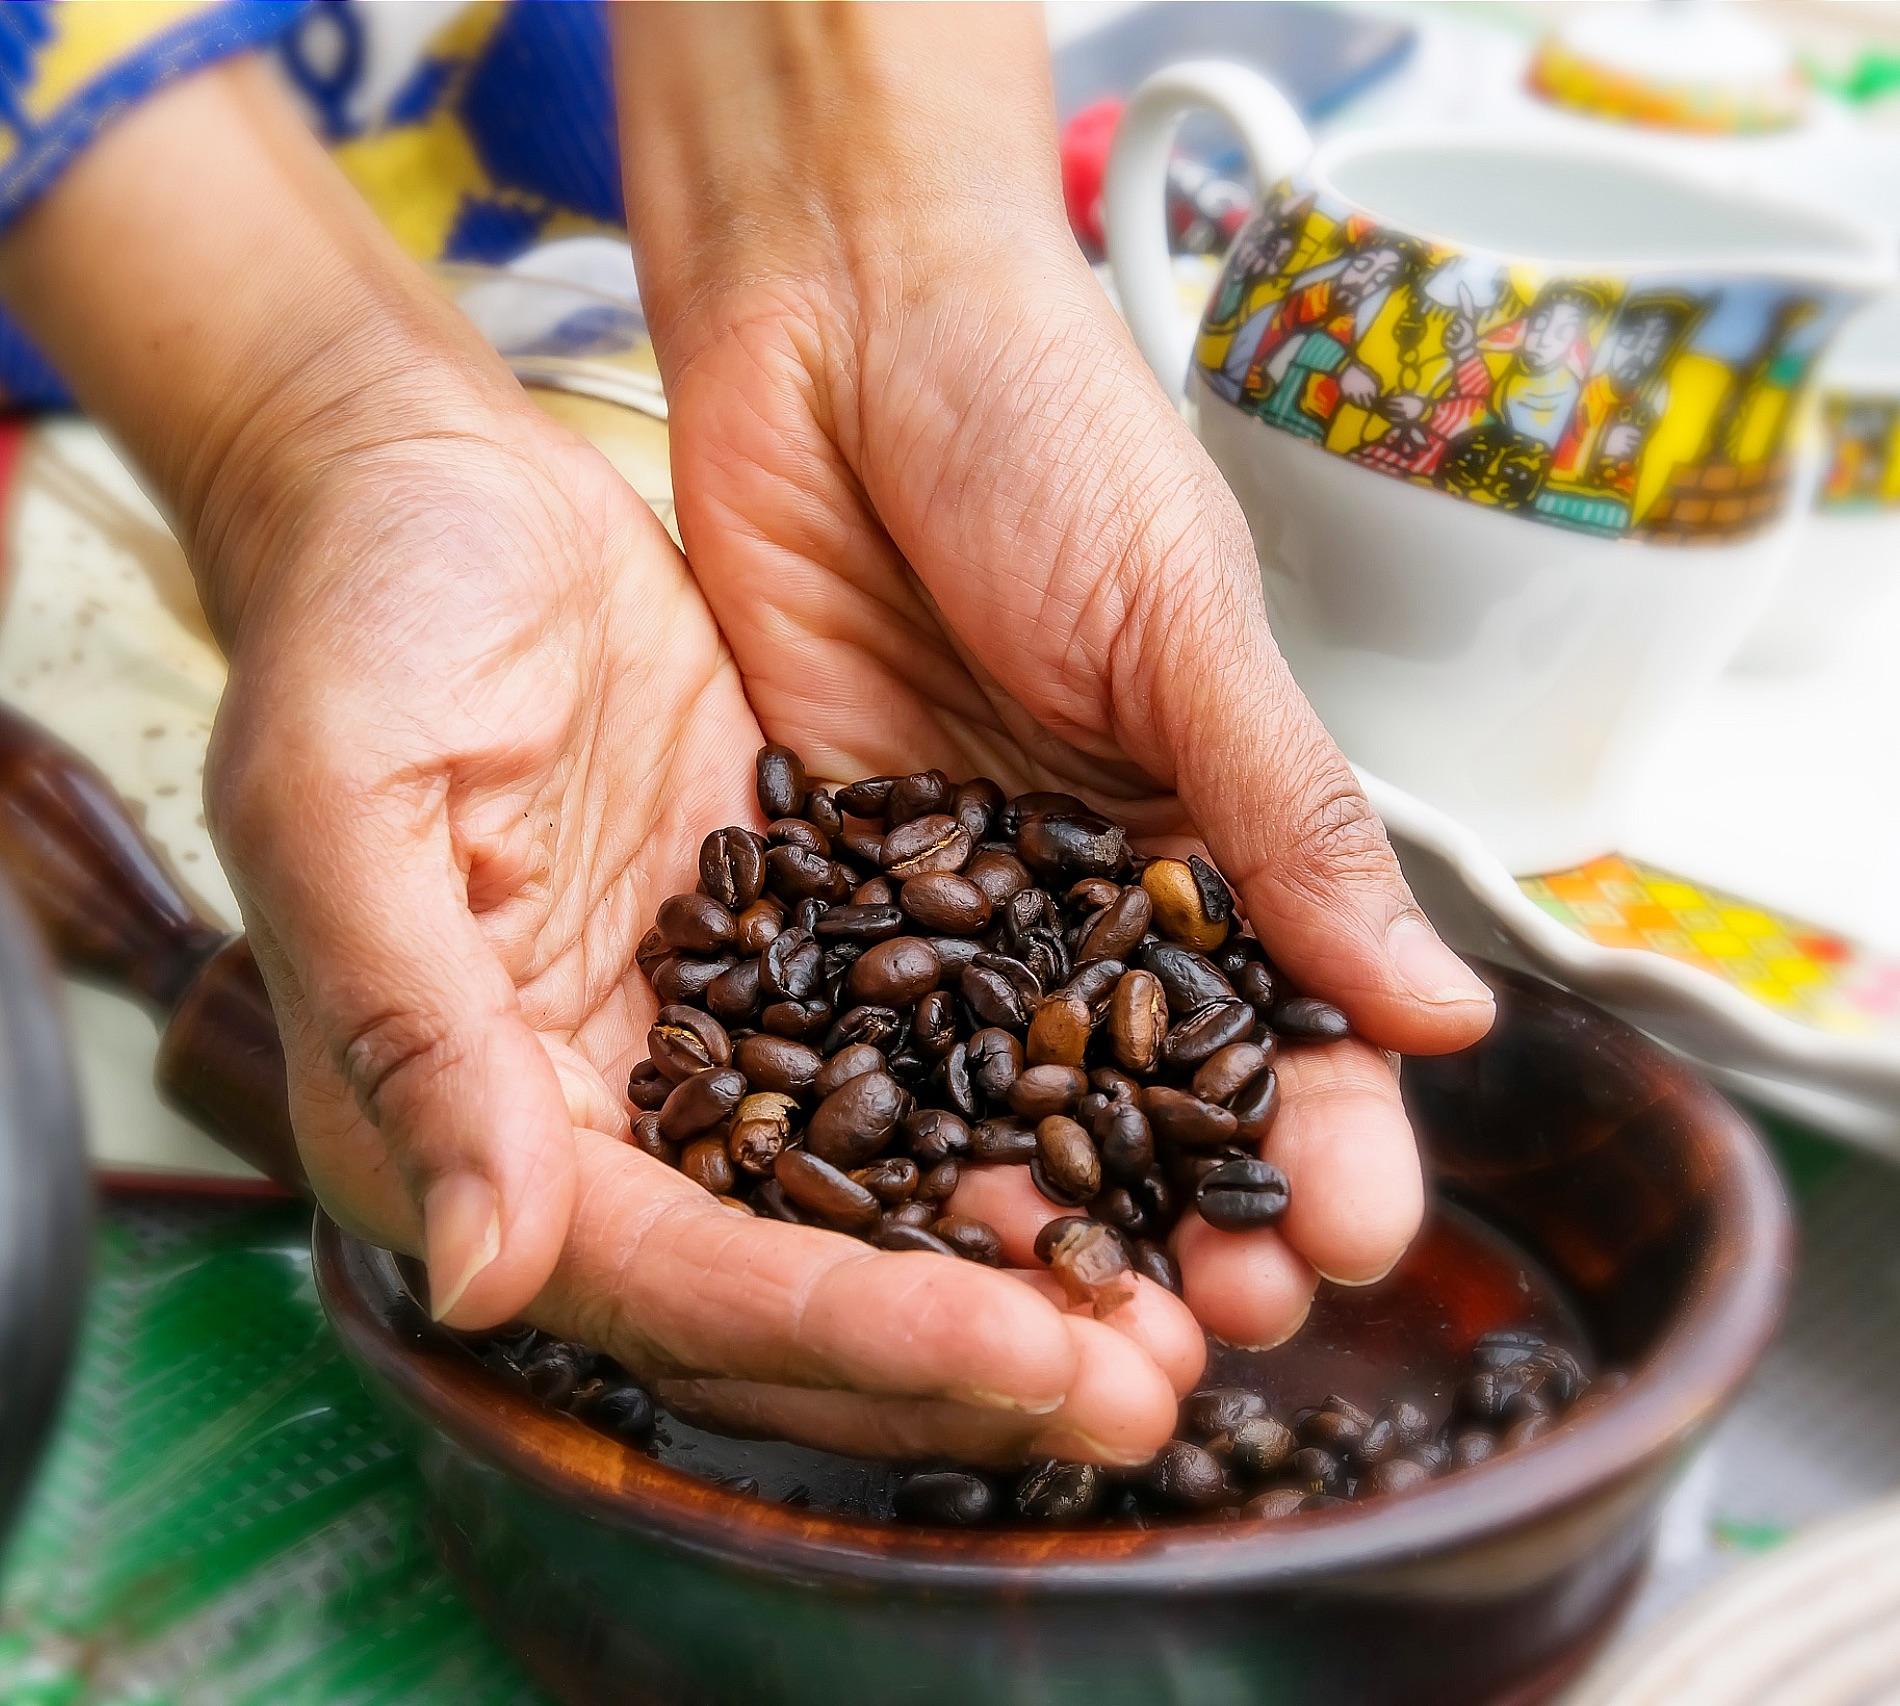 Dreamstime Habeshafood Coffeebeans Roasted Ethiopia 182097834 Web